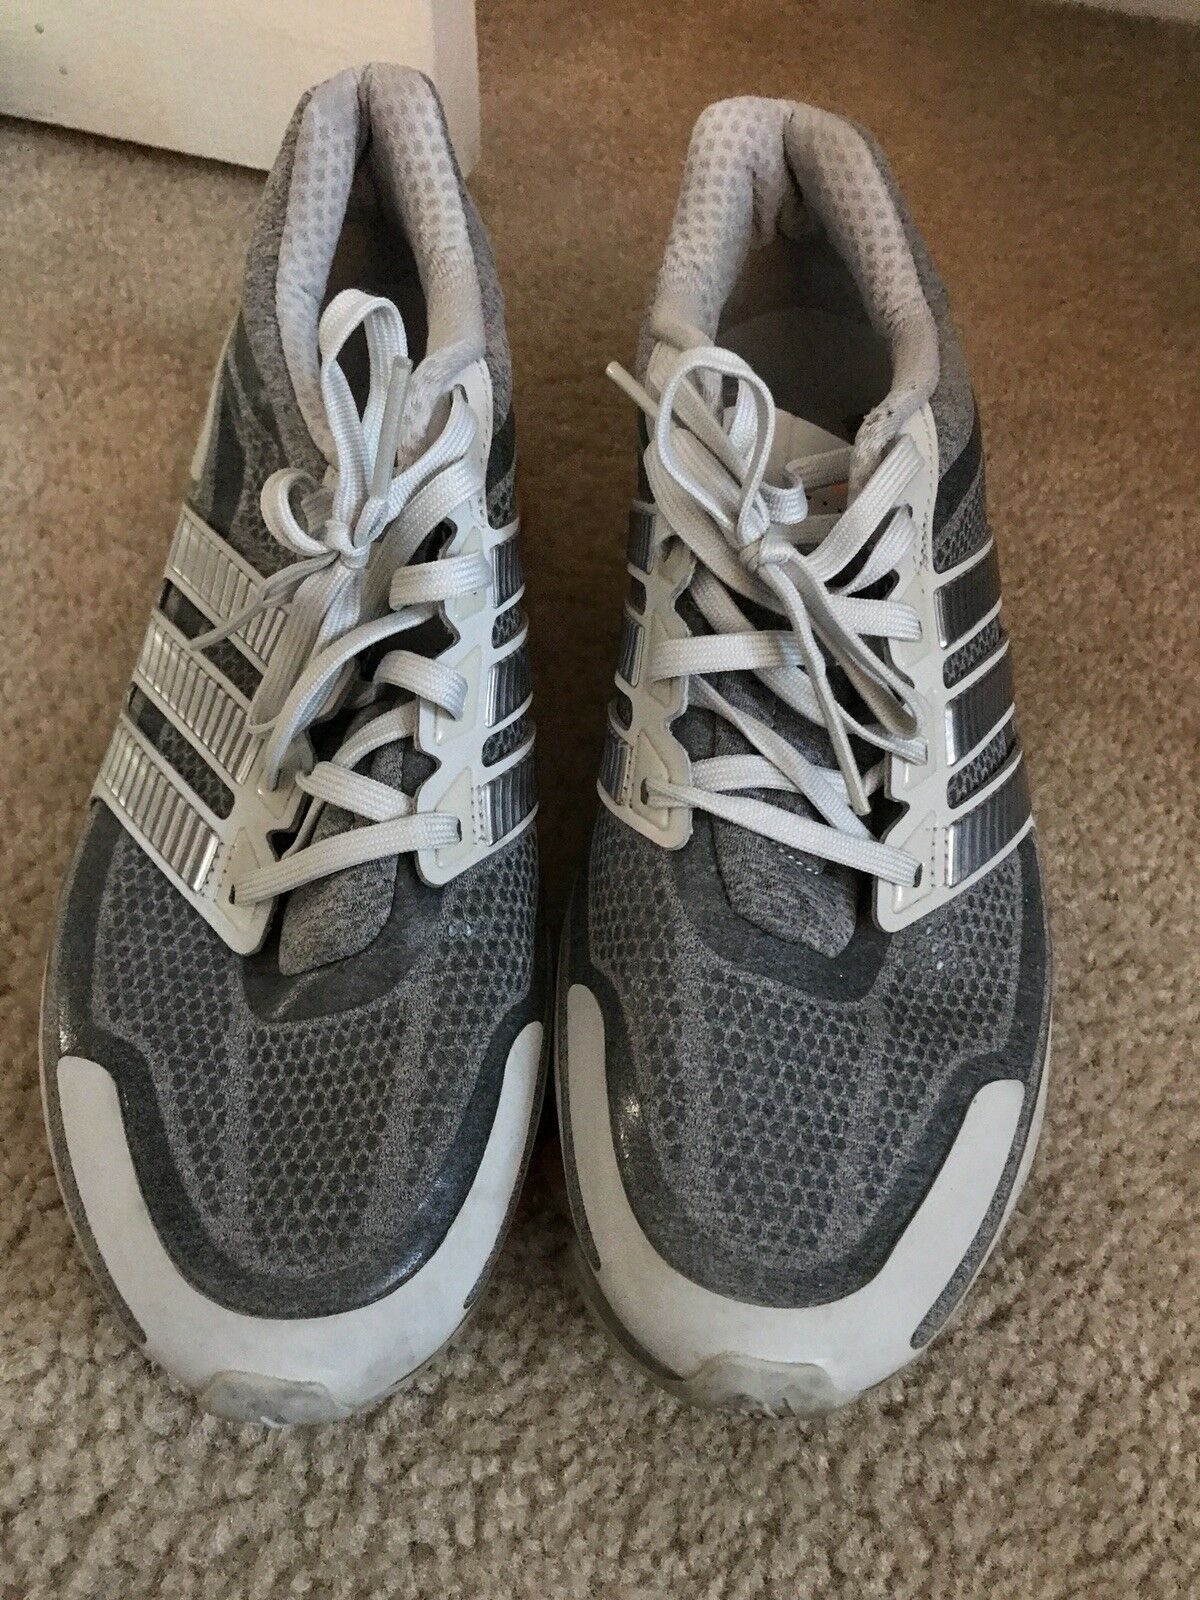 Adidas Men Size Springblade Razor Running Shoes Size Men 8US 05bdb1